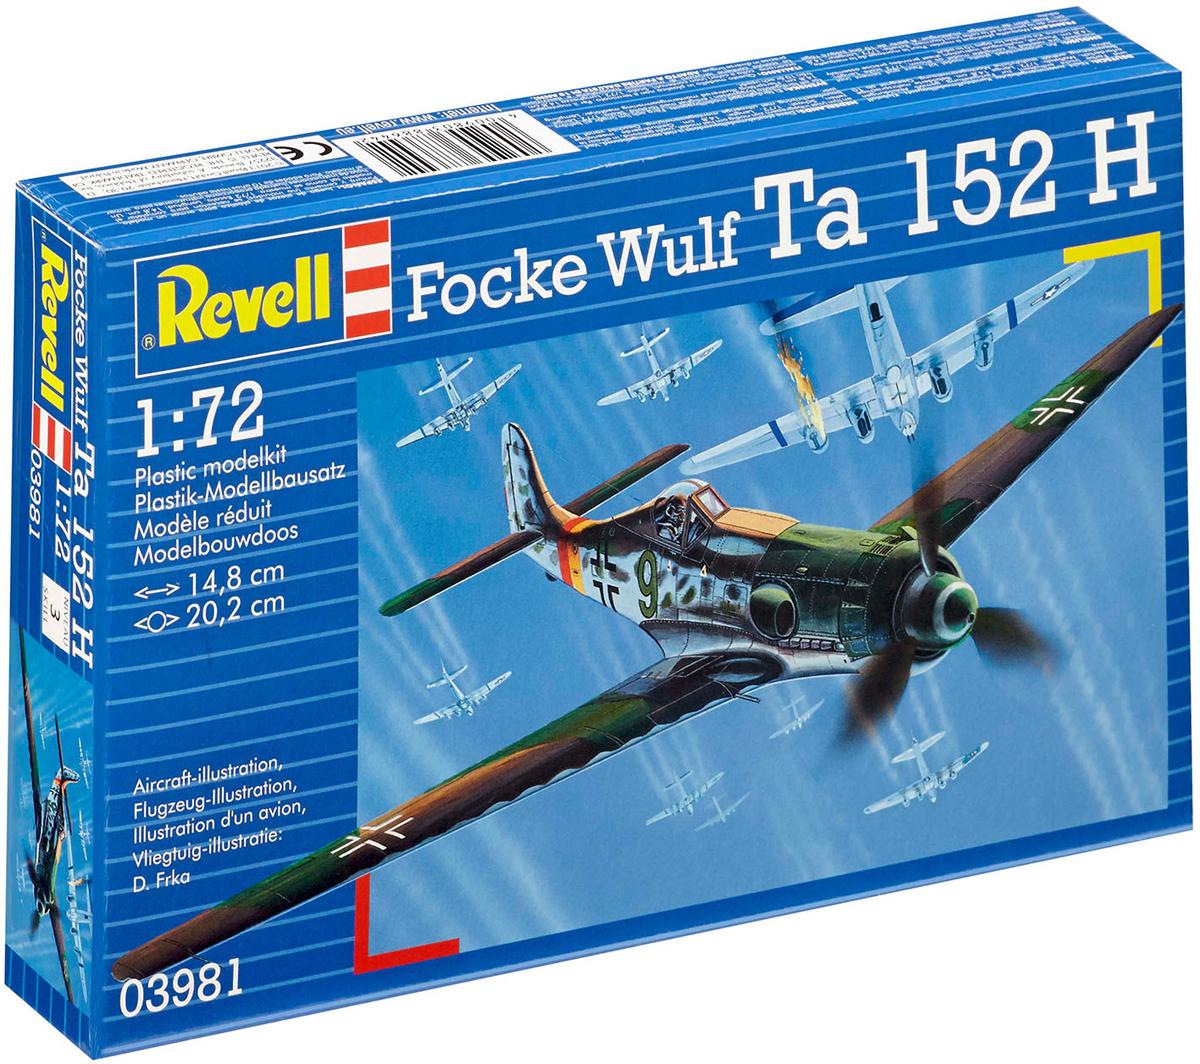 RevellМодель для сборки Сборная модель немецкого самолета Focke Wulf Ta 152 H Revell